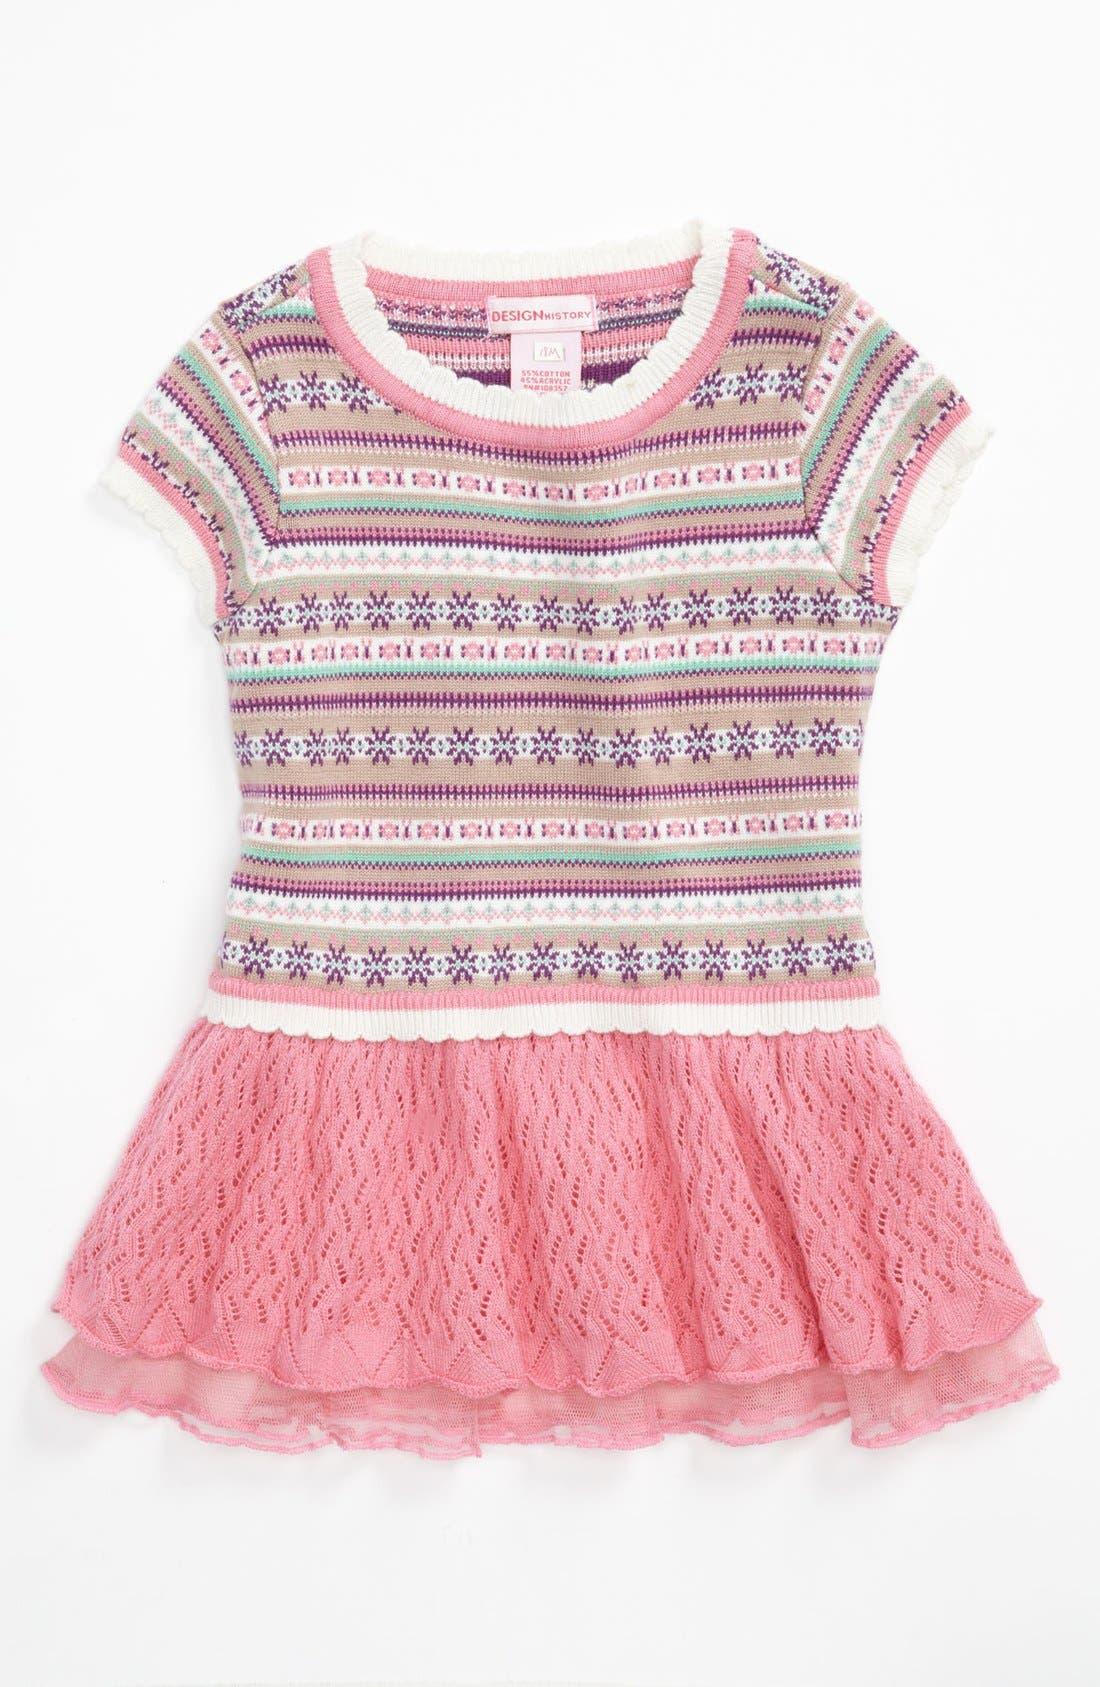 Alternate Image 1 Selected - Design History 'Fair Isle' Dress (Baby Girls)